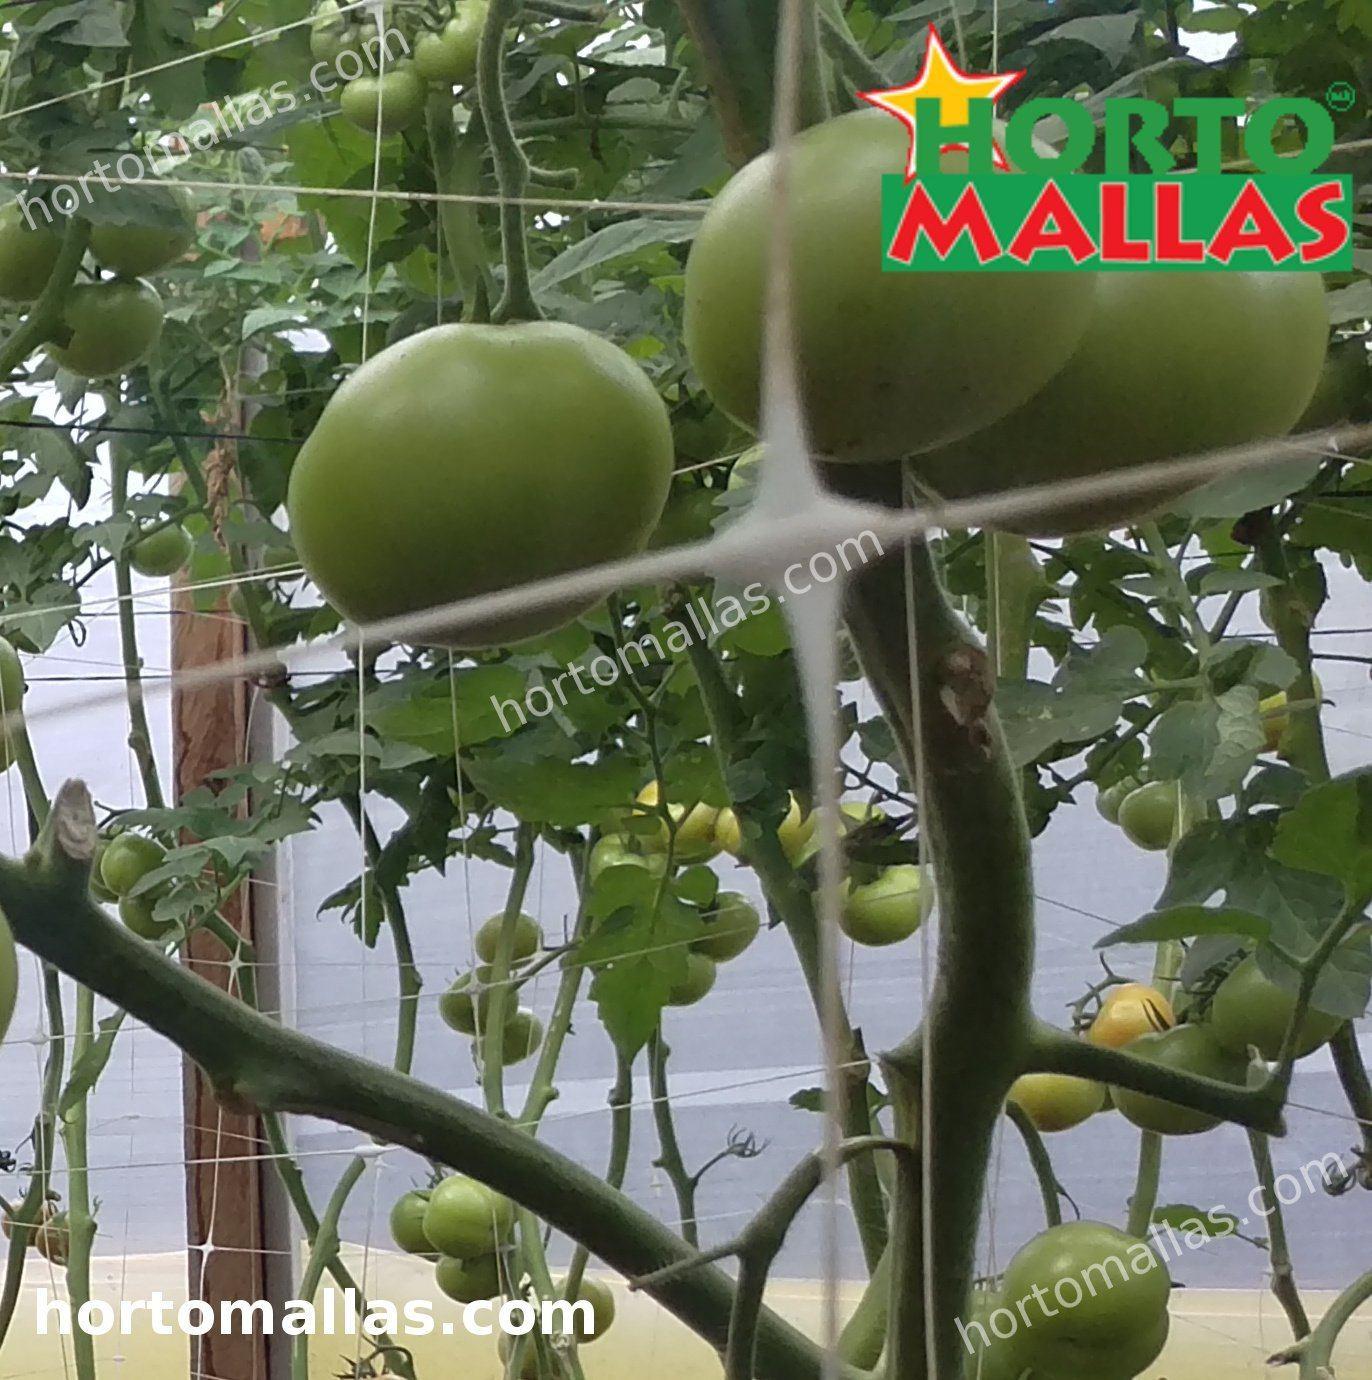 trellis net providing support to tomato crops